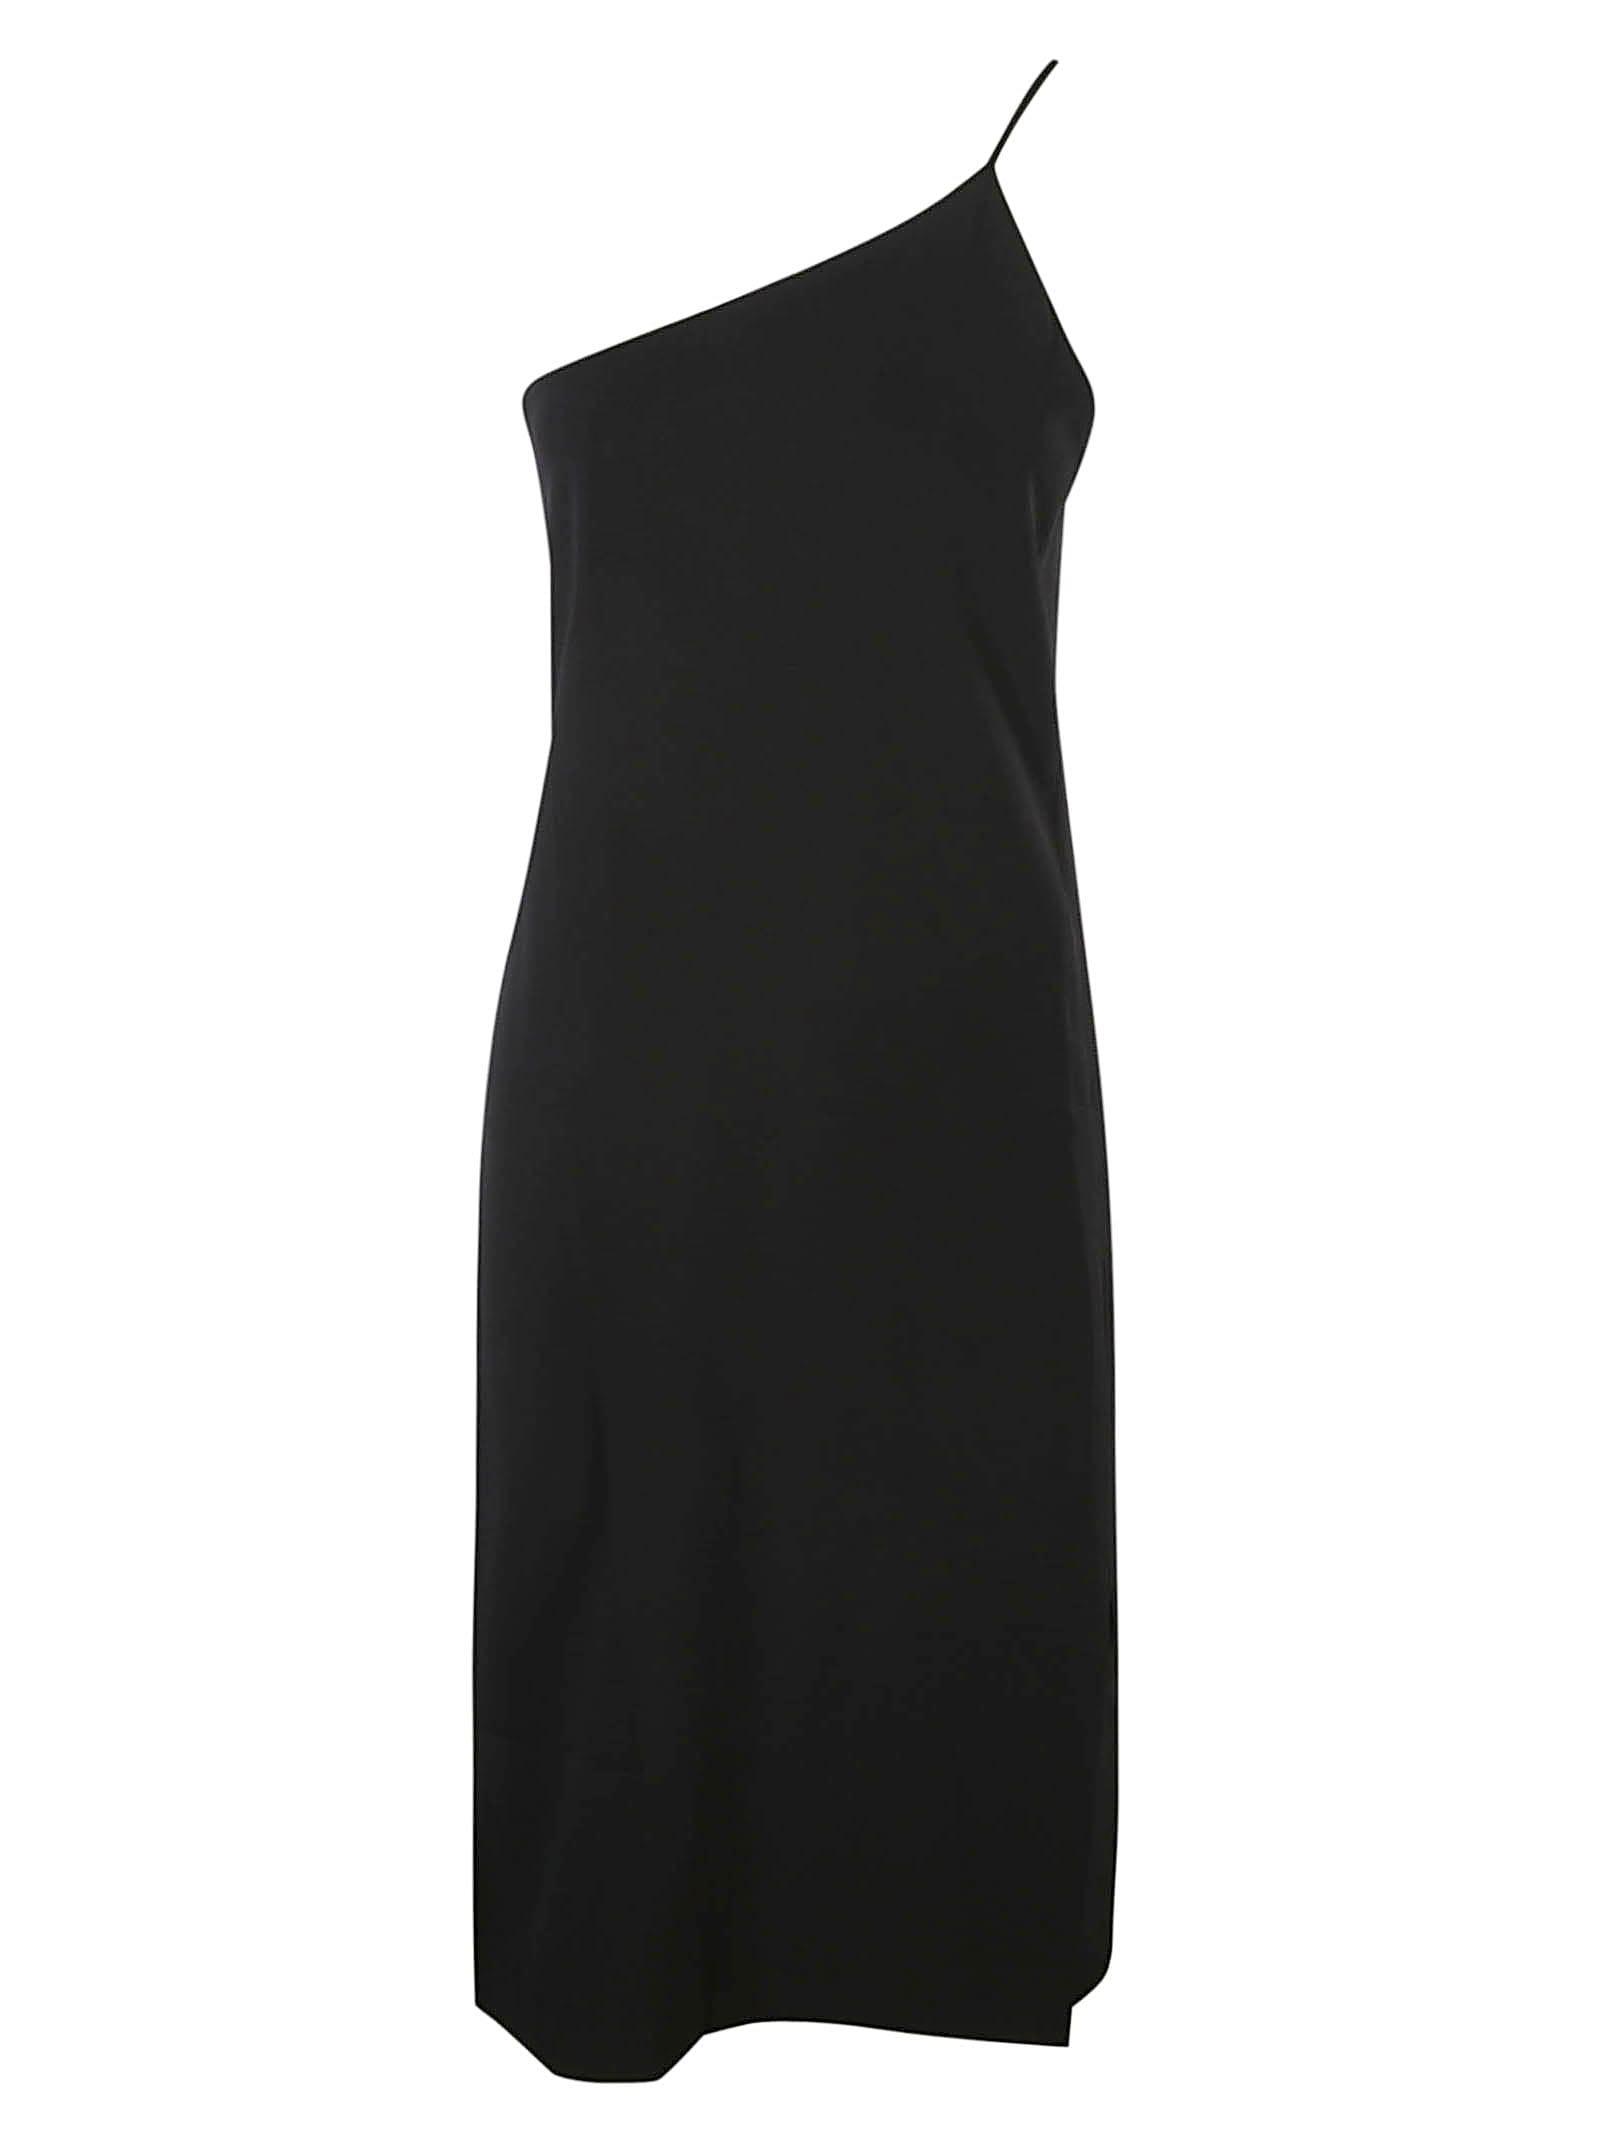 Acne Studios Asymmetric One-shoulder Slim Dress